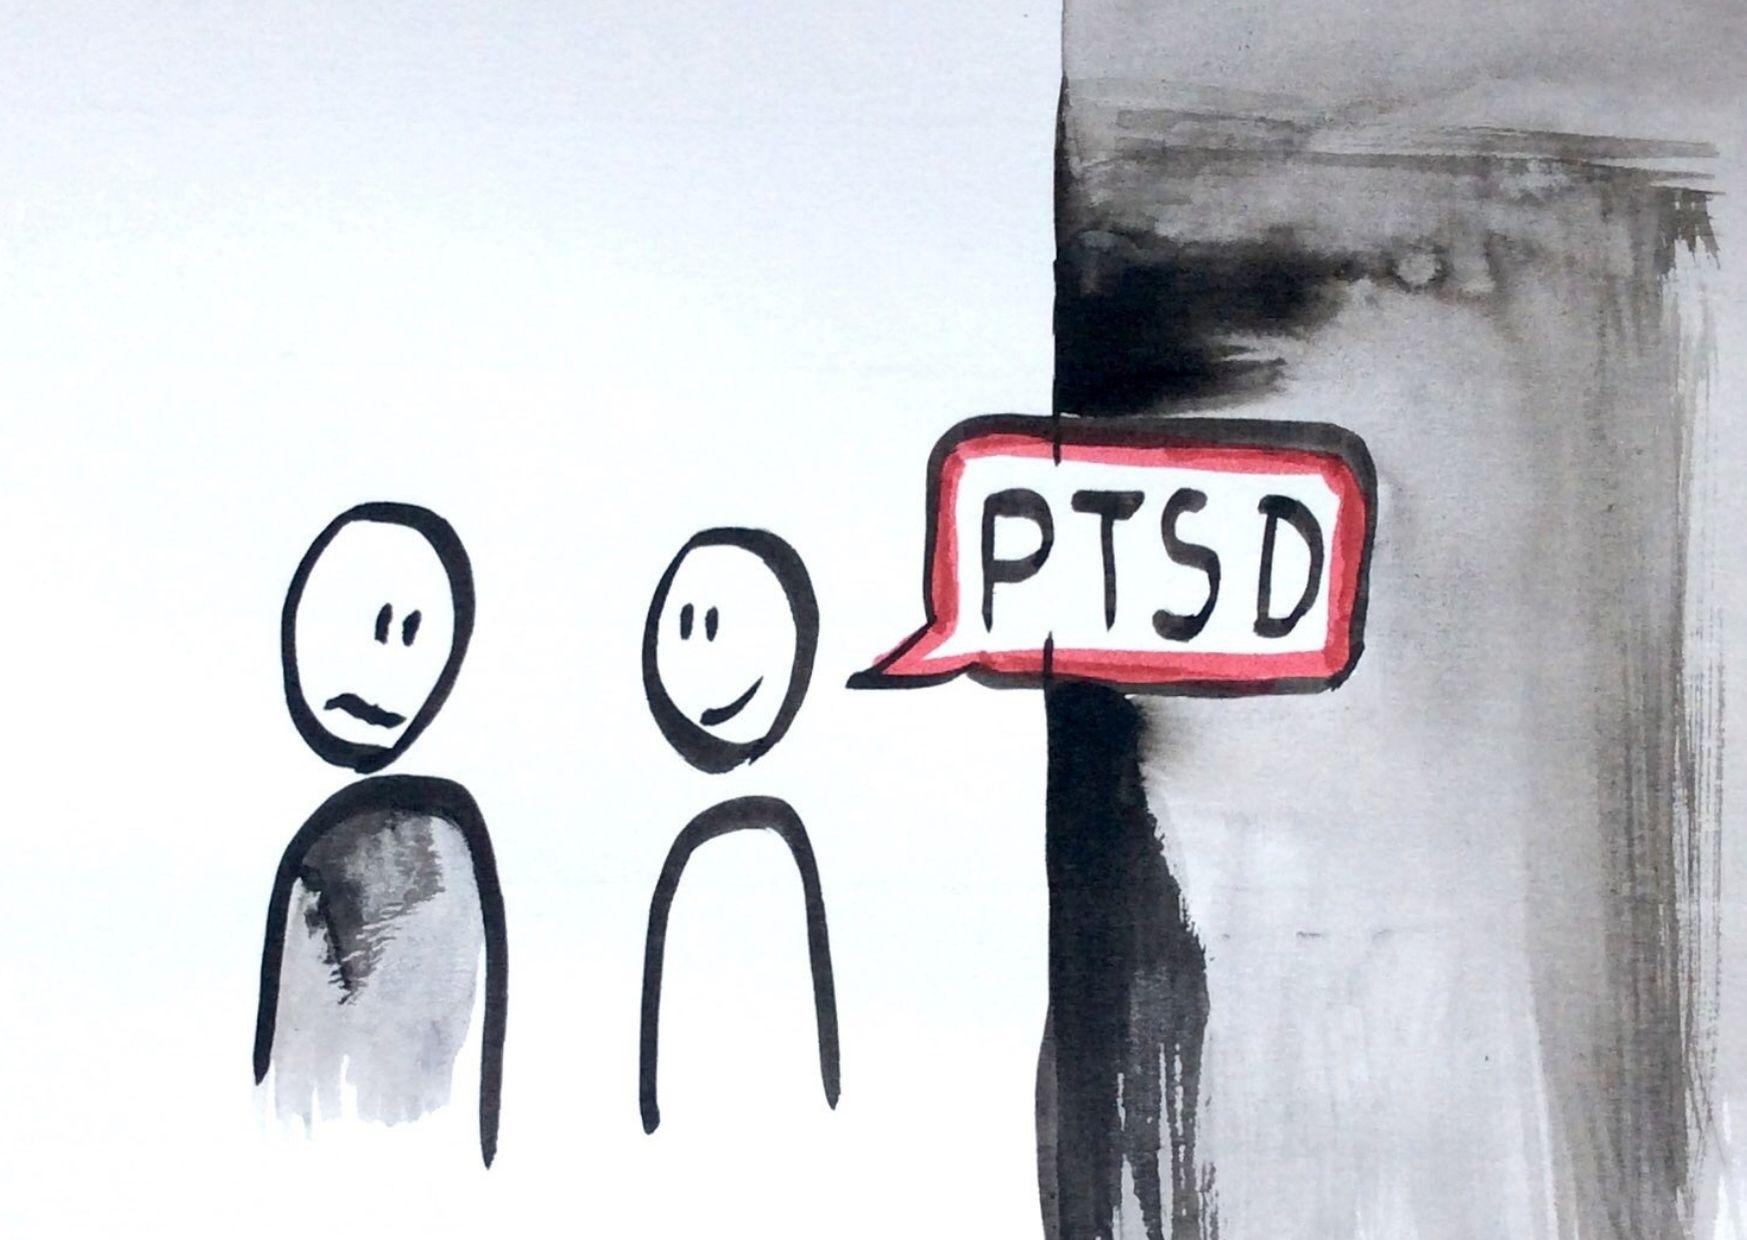 Trauma Skillstraining 2: PTSD